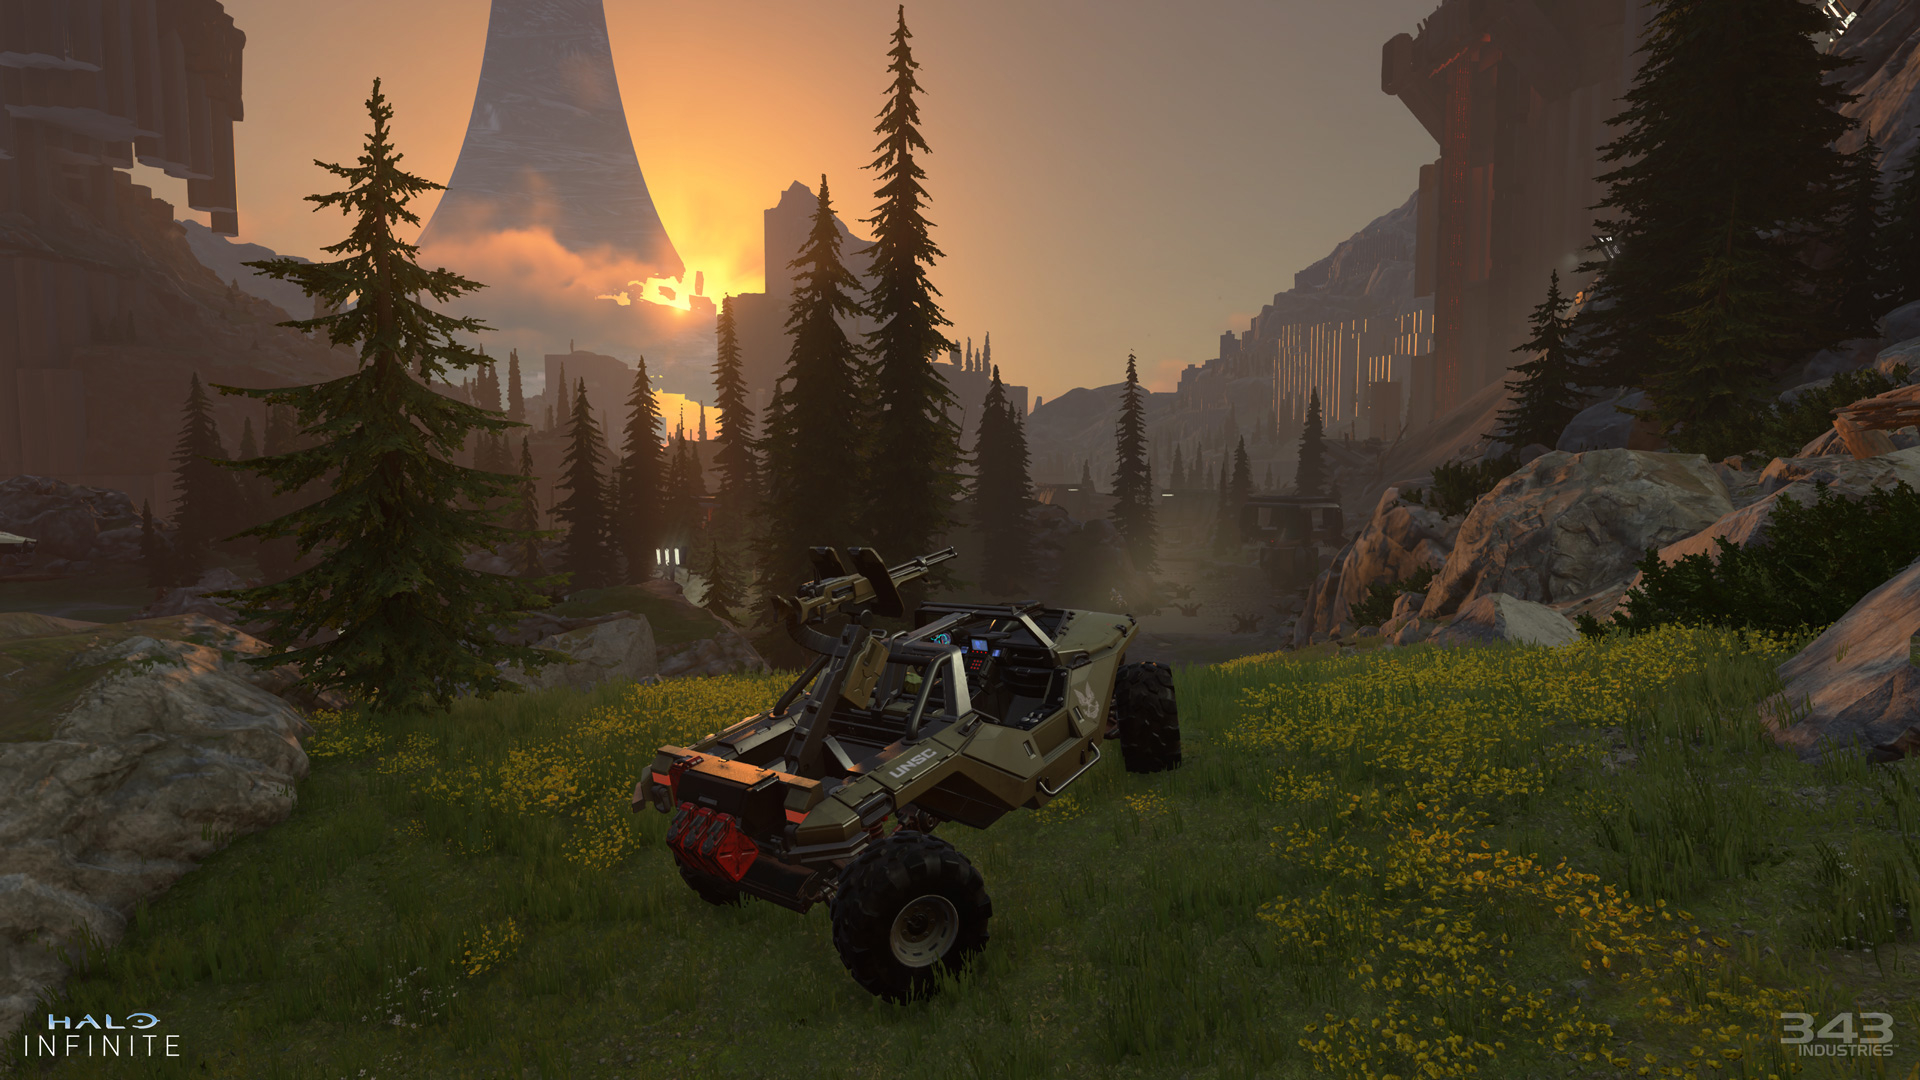 Microsoft: перенос Halo Infinite не повлияет на продажи Xbox Series X и S, ведь на консолях будут доступны «тысячи игр»